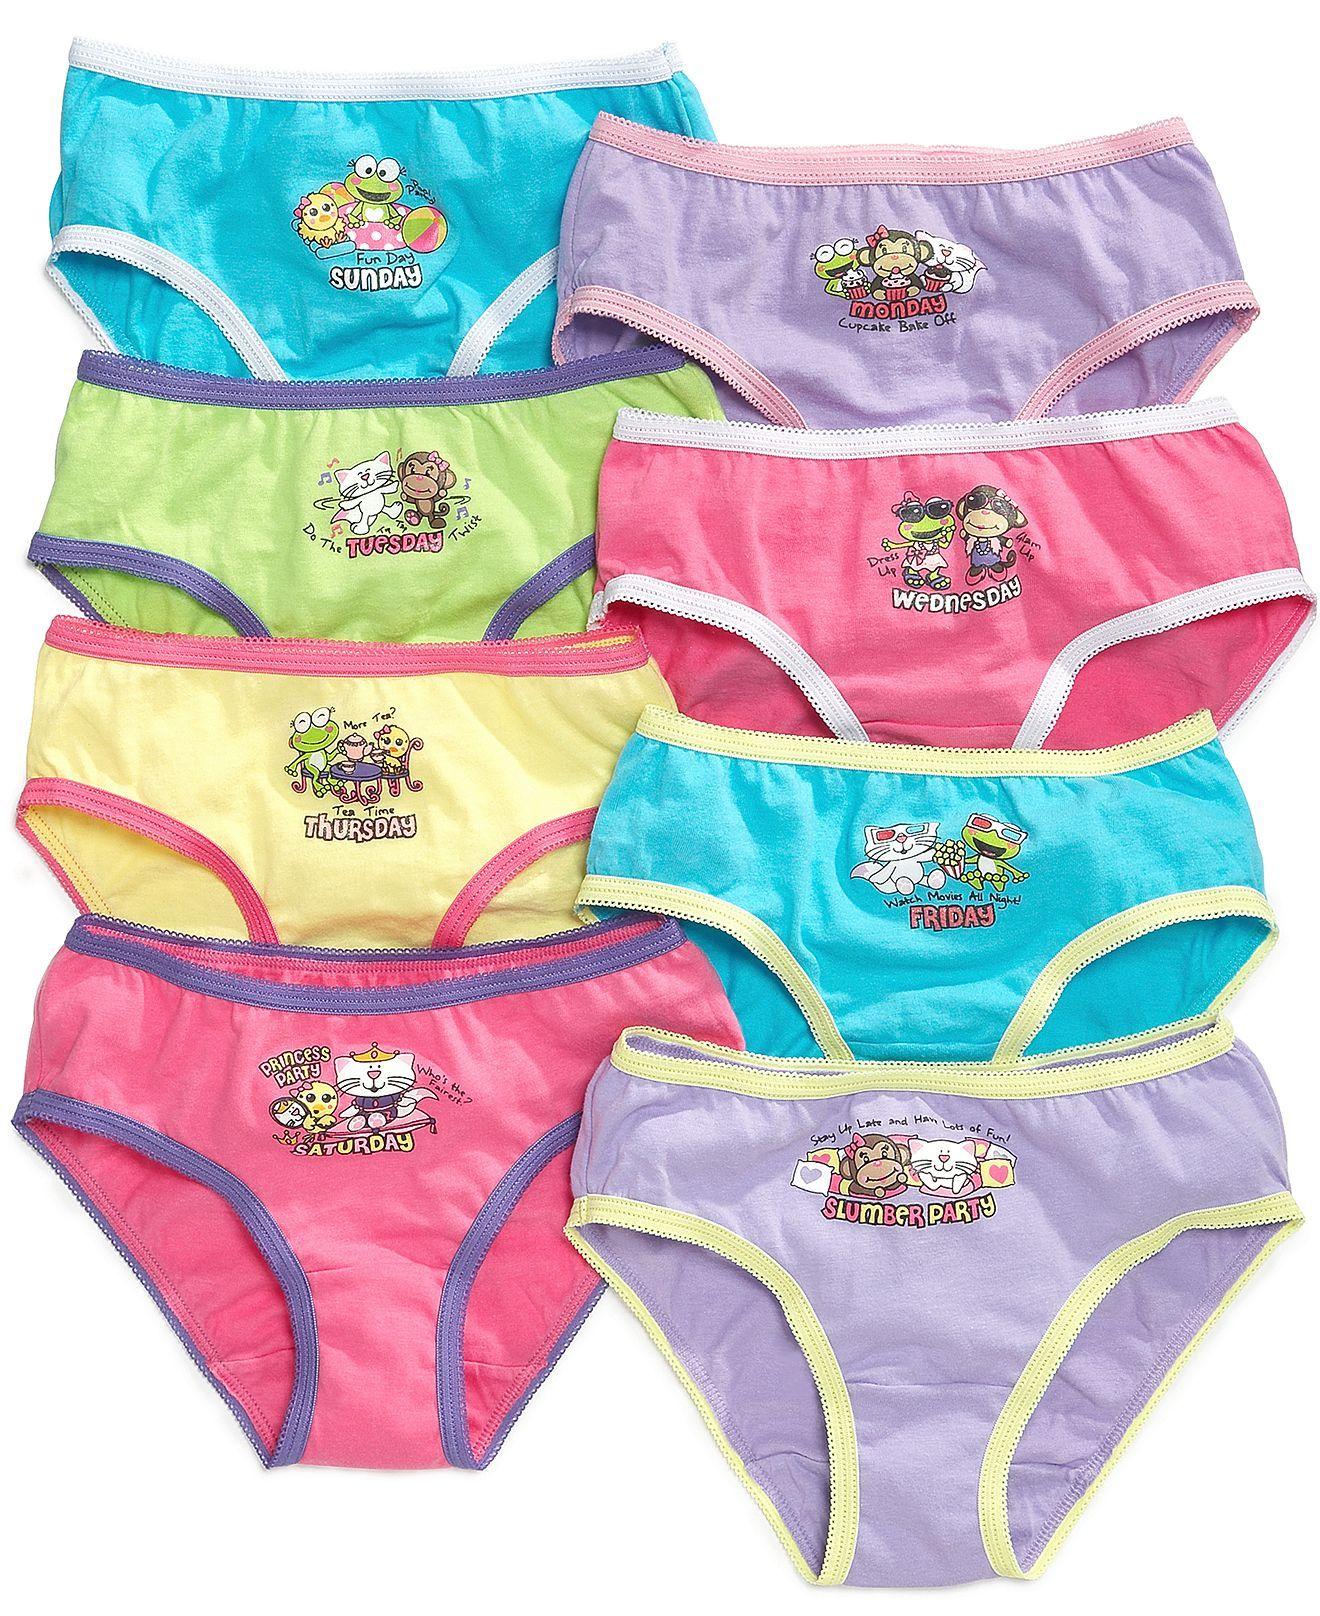 bd5ee6859fb0 So Jenni Kids Underwear